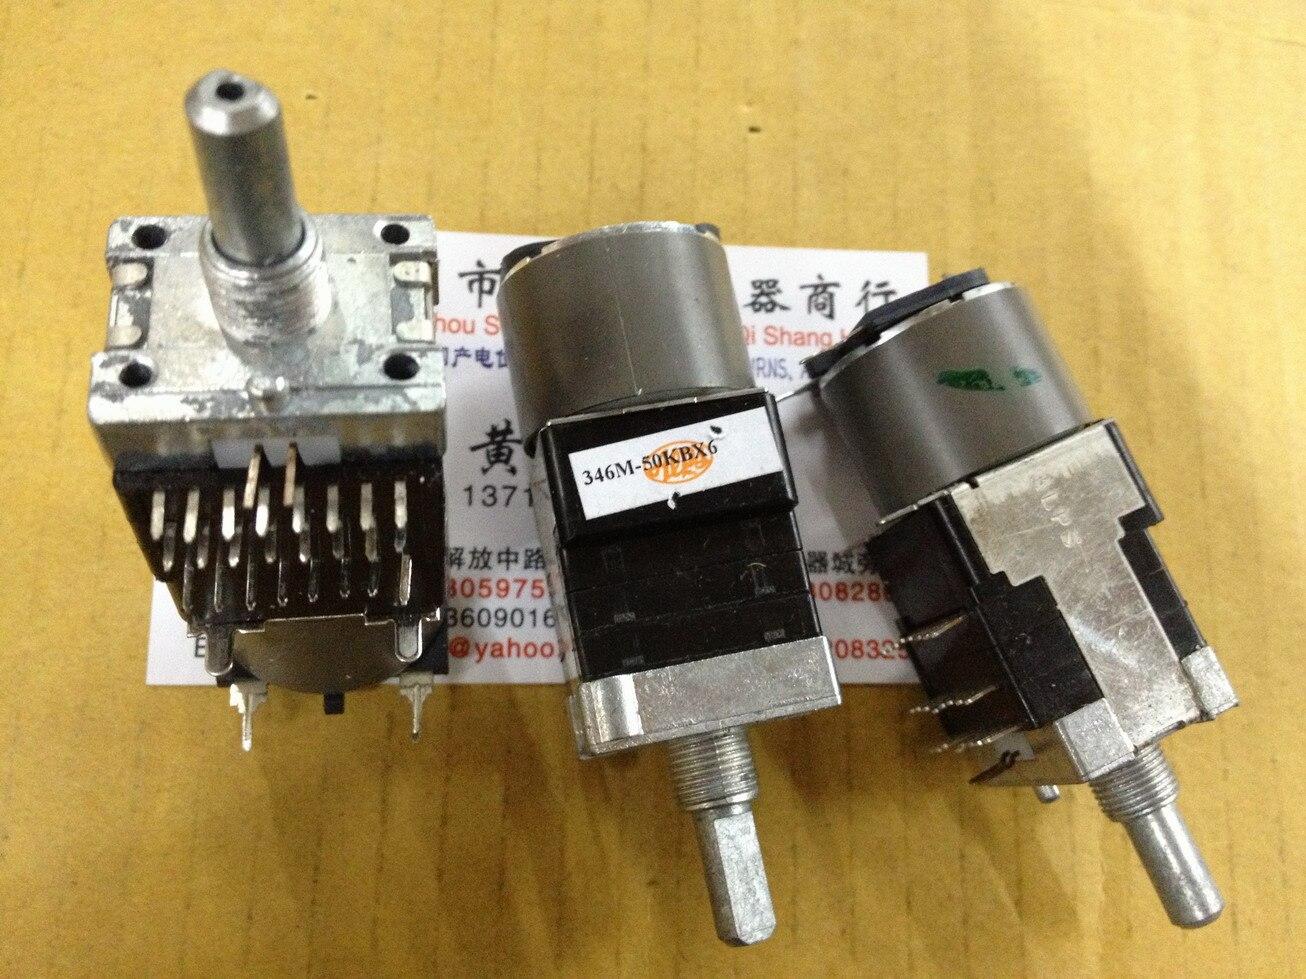 [VK] اليابان ALPS 168 ستة محركات مقياس الجهد B50K [بدون صنبور] التبديل